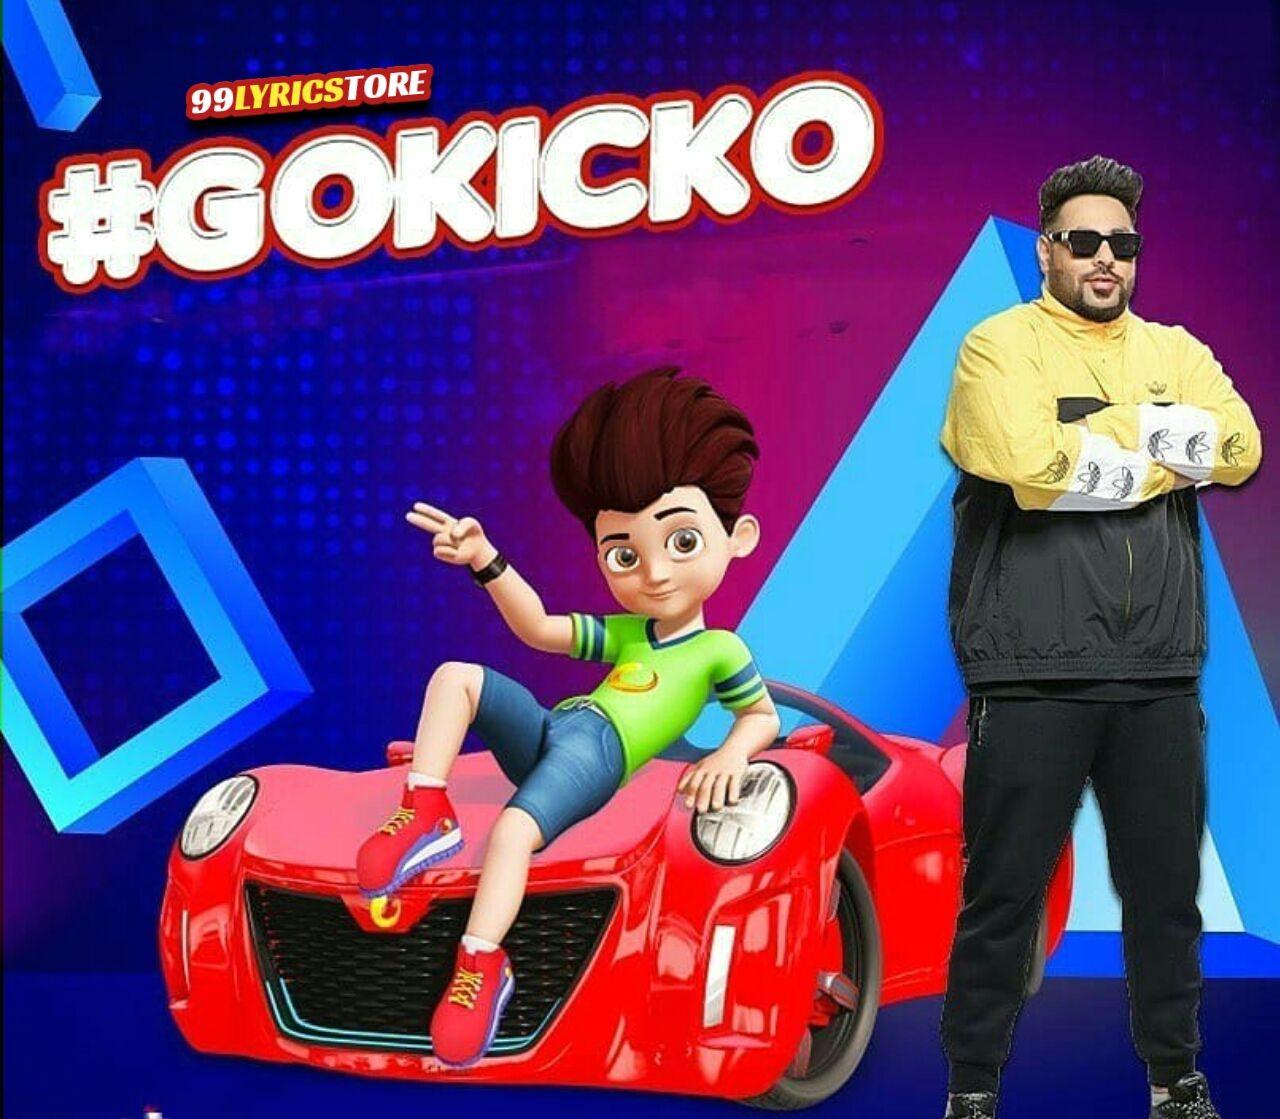 Gokicko rap song lyrics sung by Badshah